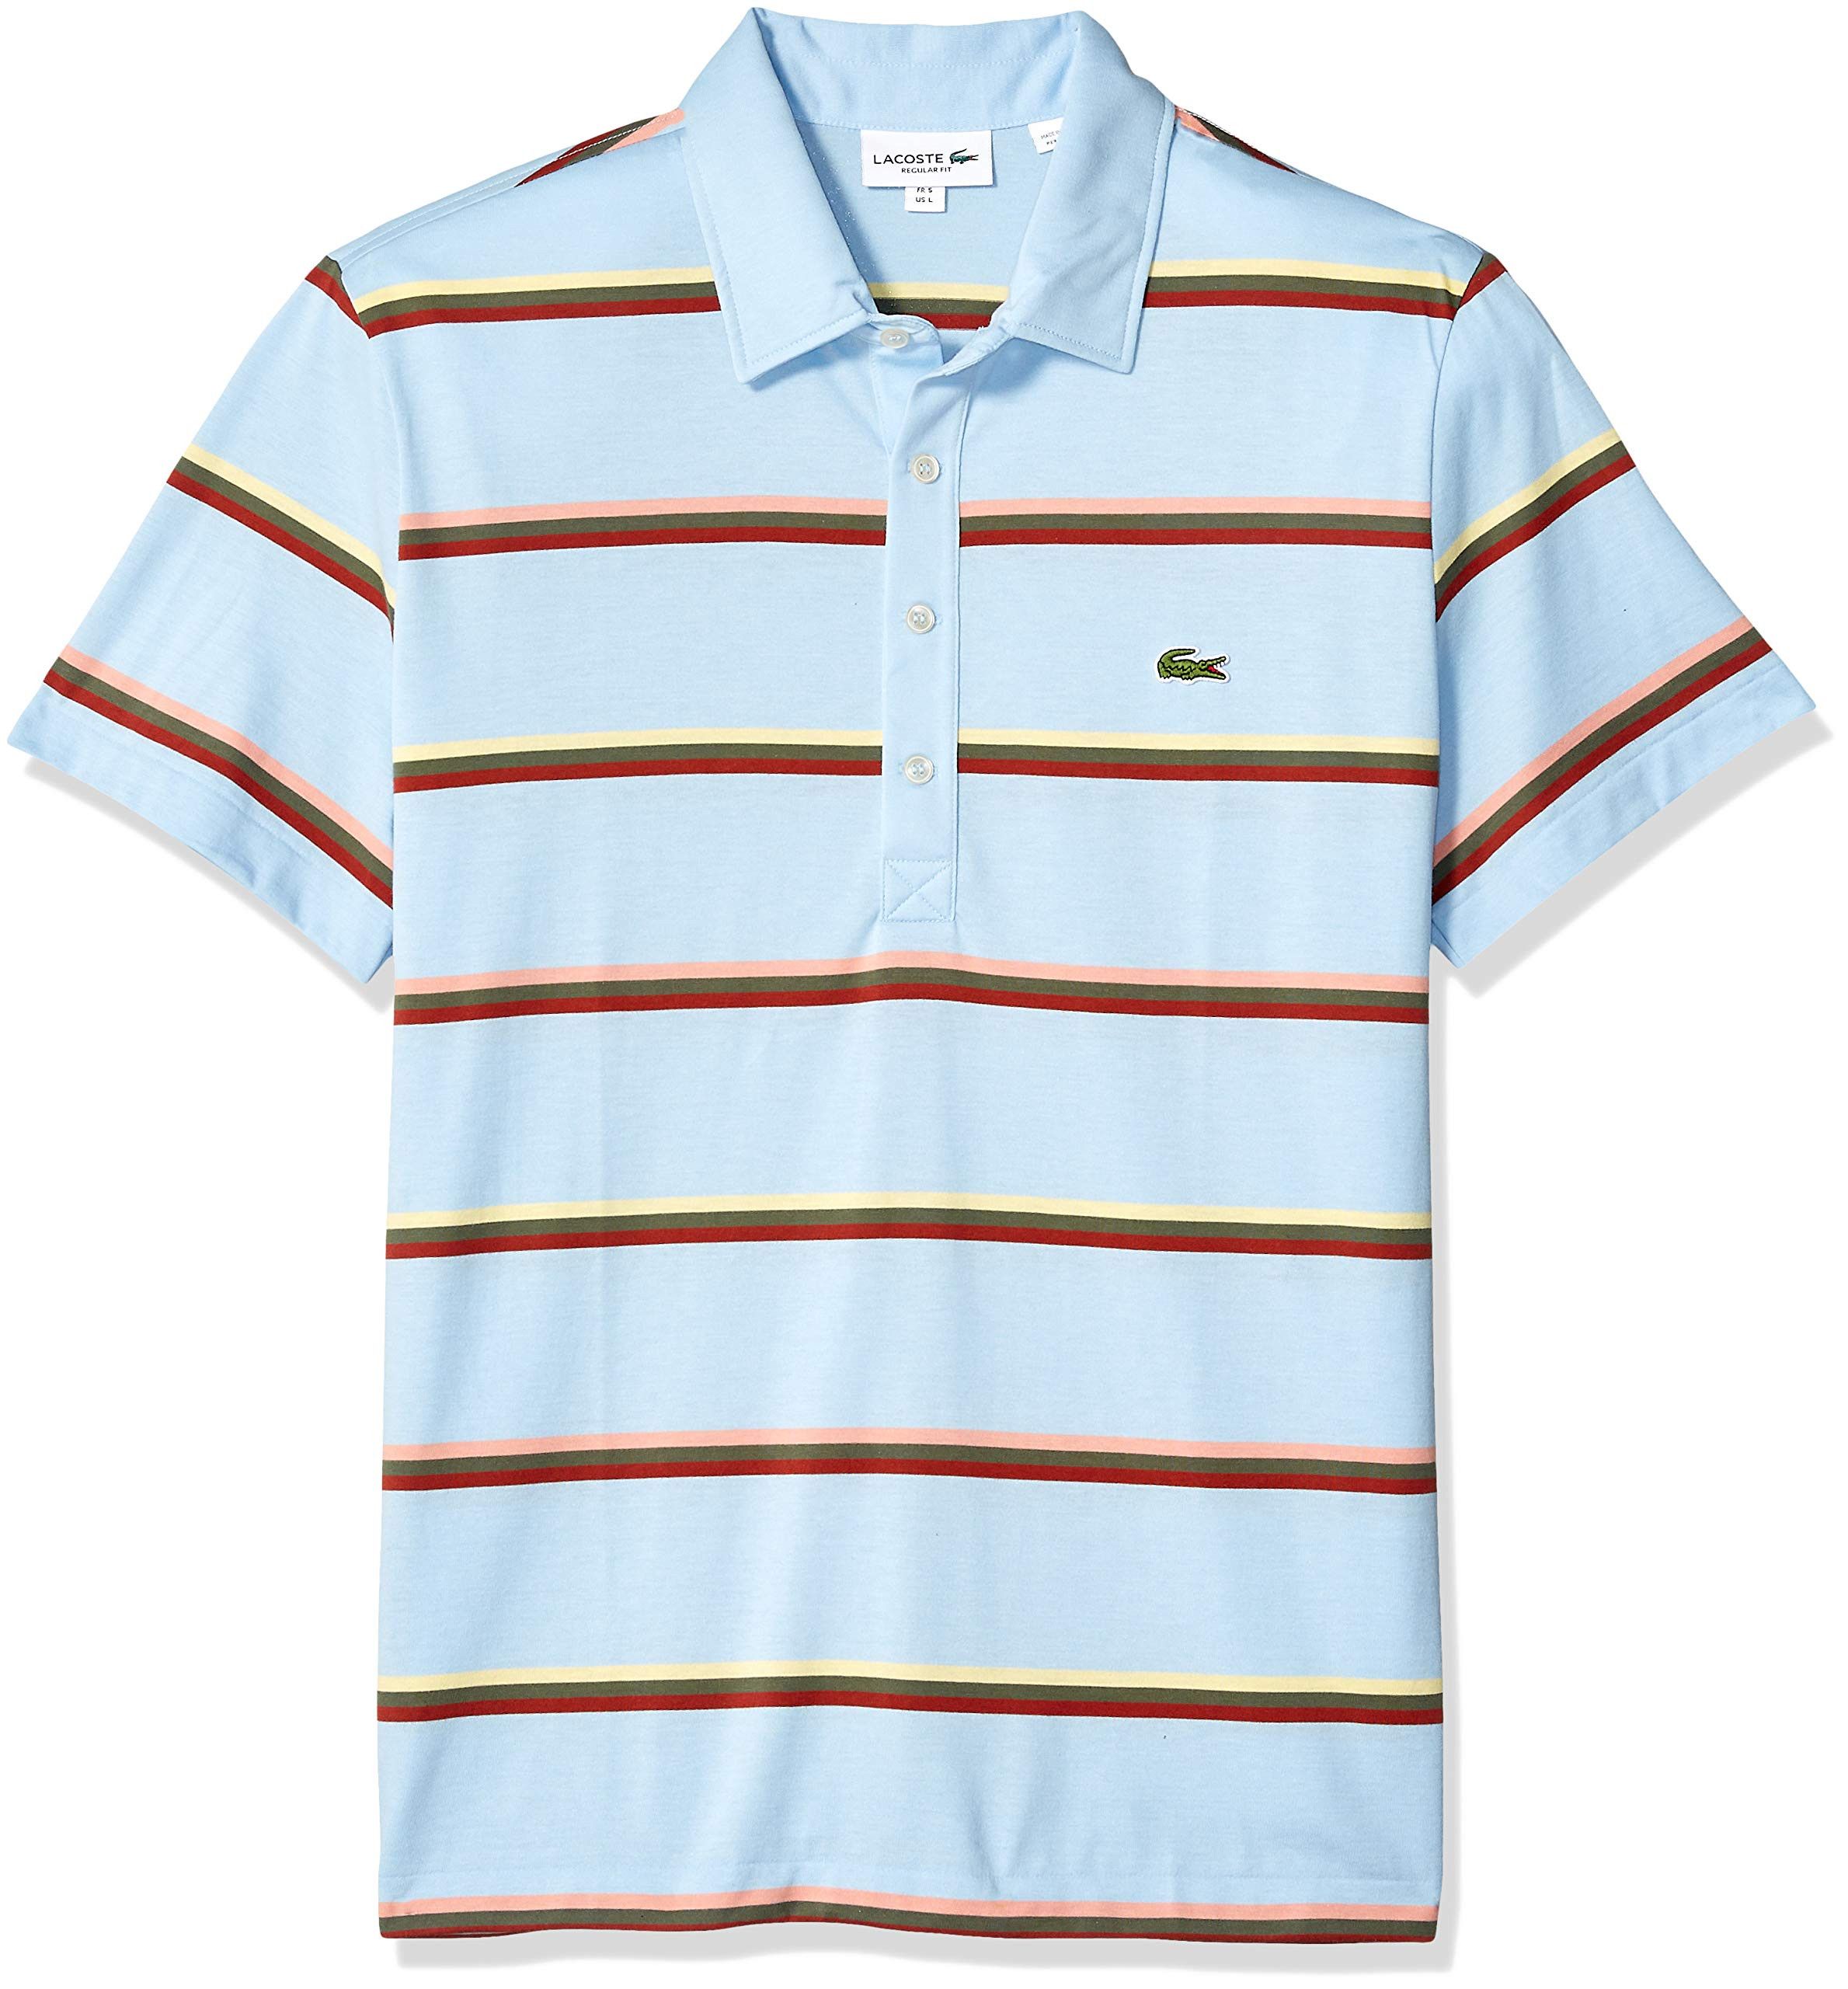 Lacoste Men's S/S Striped Light Jersey PIMA Cotton